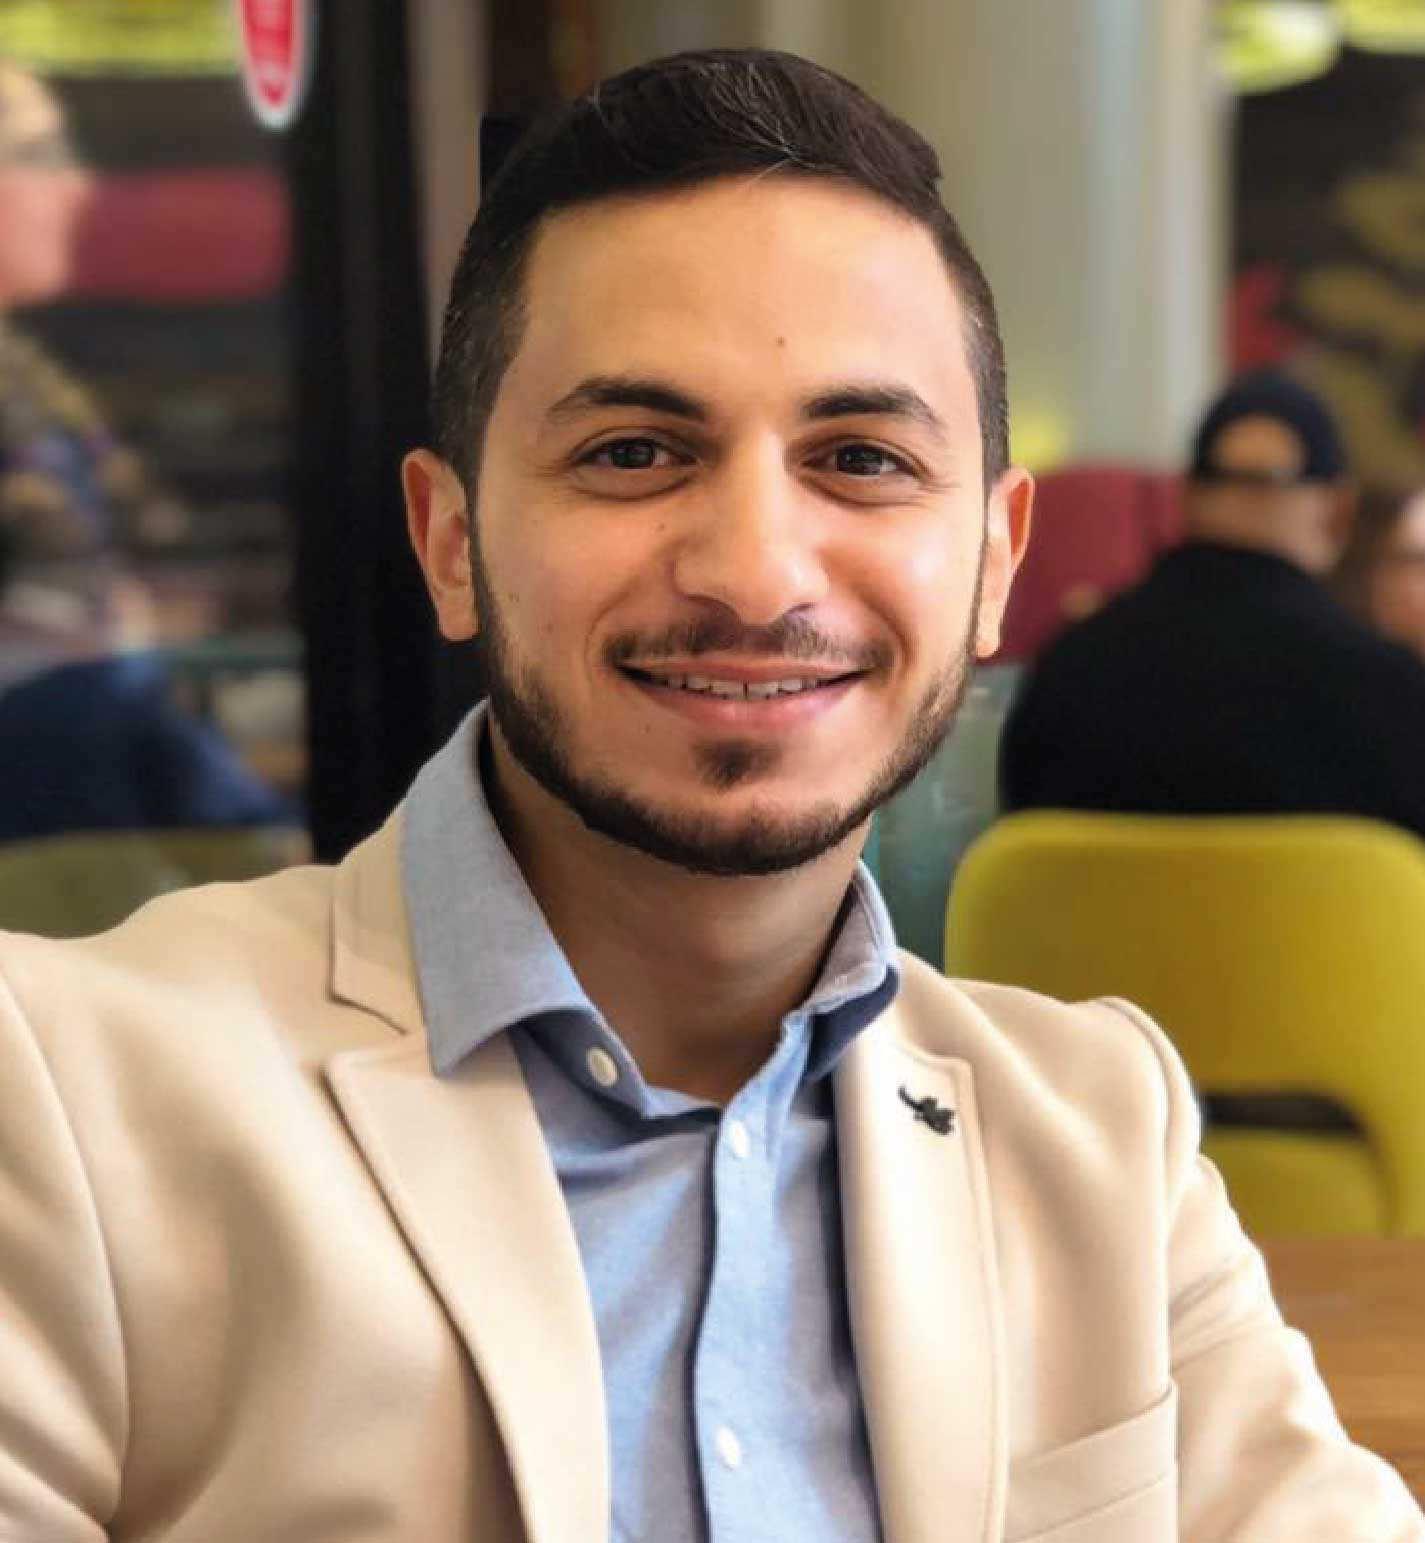 Eng. Maher Al Turk